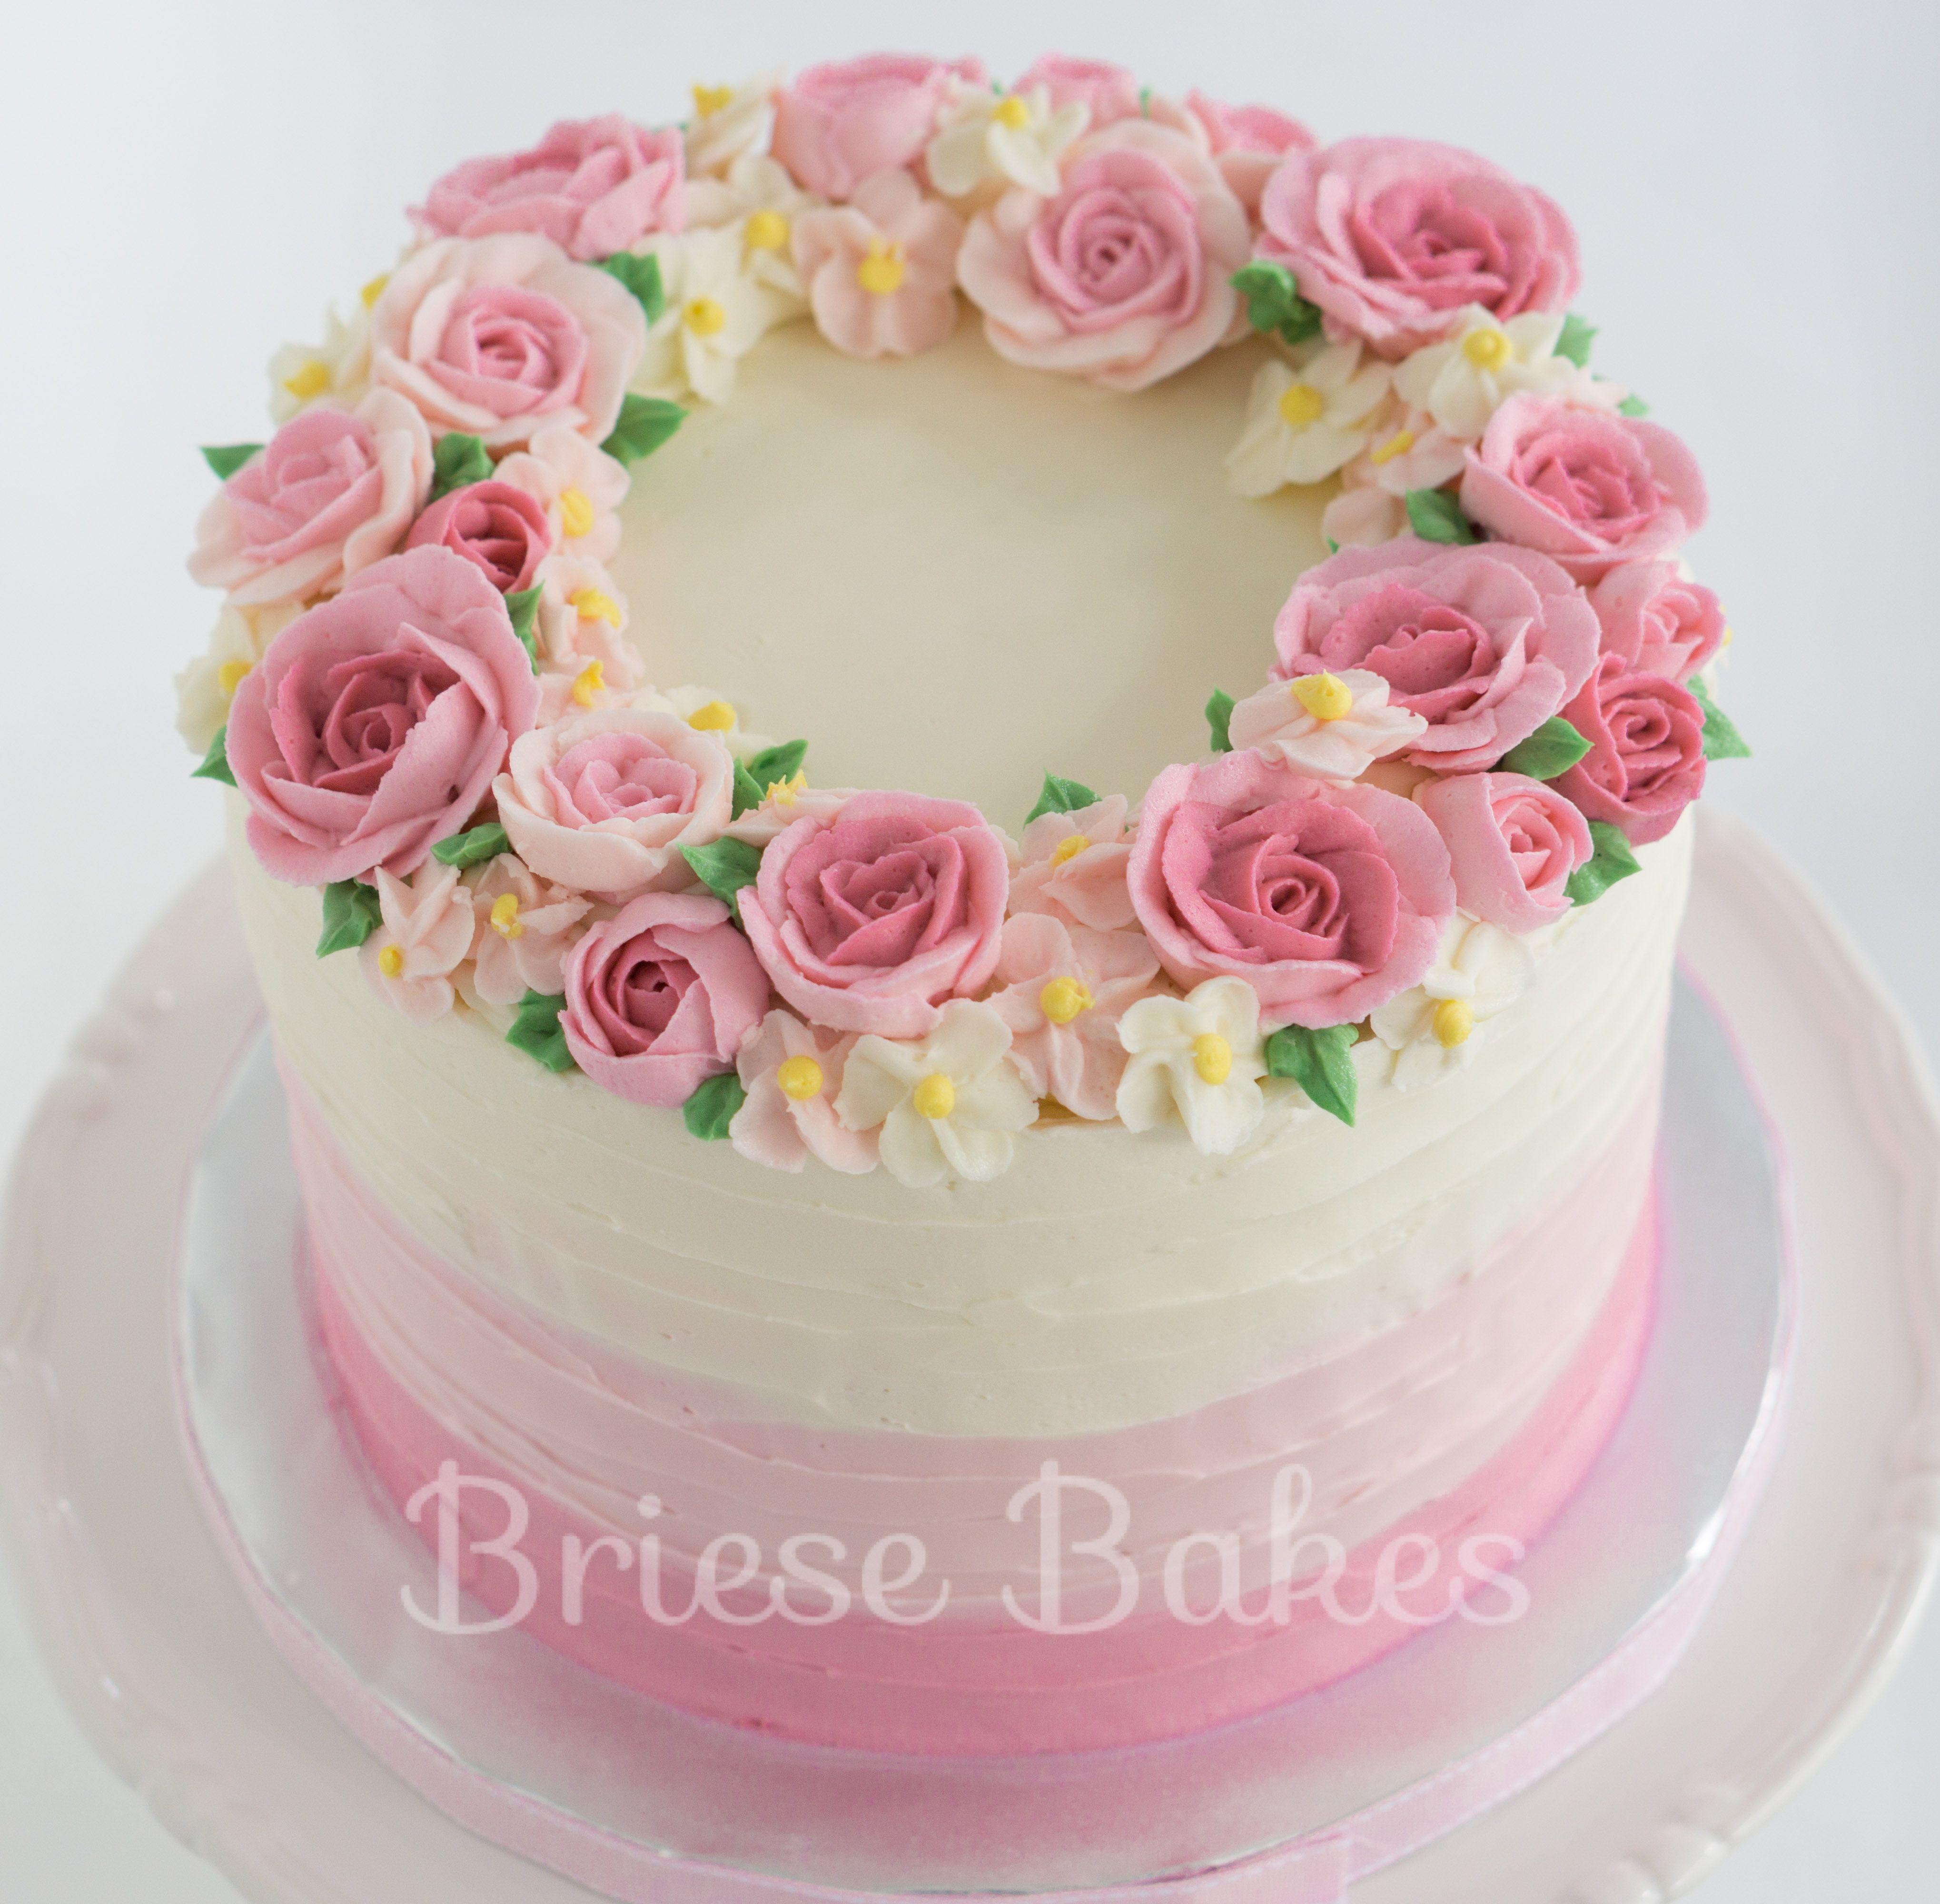 Astonishing Buttercream Flower Cake With Images Buttercream Cake Designs Funny Birthday Cards Online Hendilapandamsfinfo